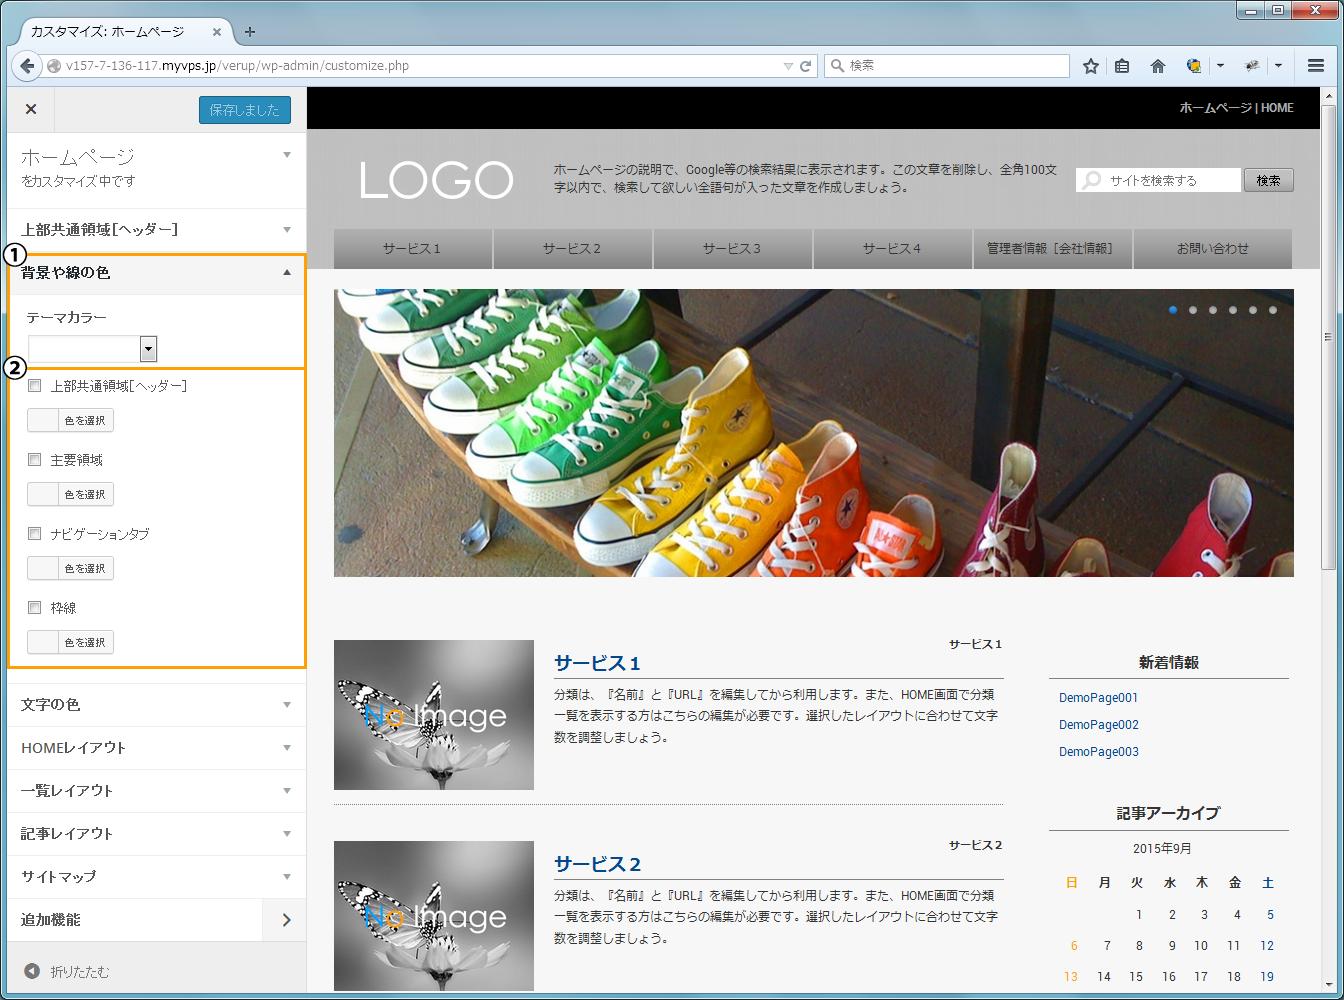 Webサイトデザイン 背景や線の色 | 簡単格安ホームページ作成サイト - FunMaker[ファンメイカー]